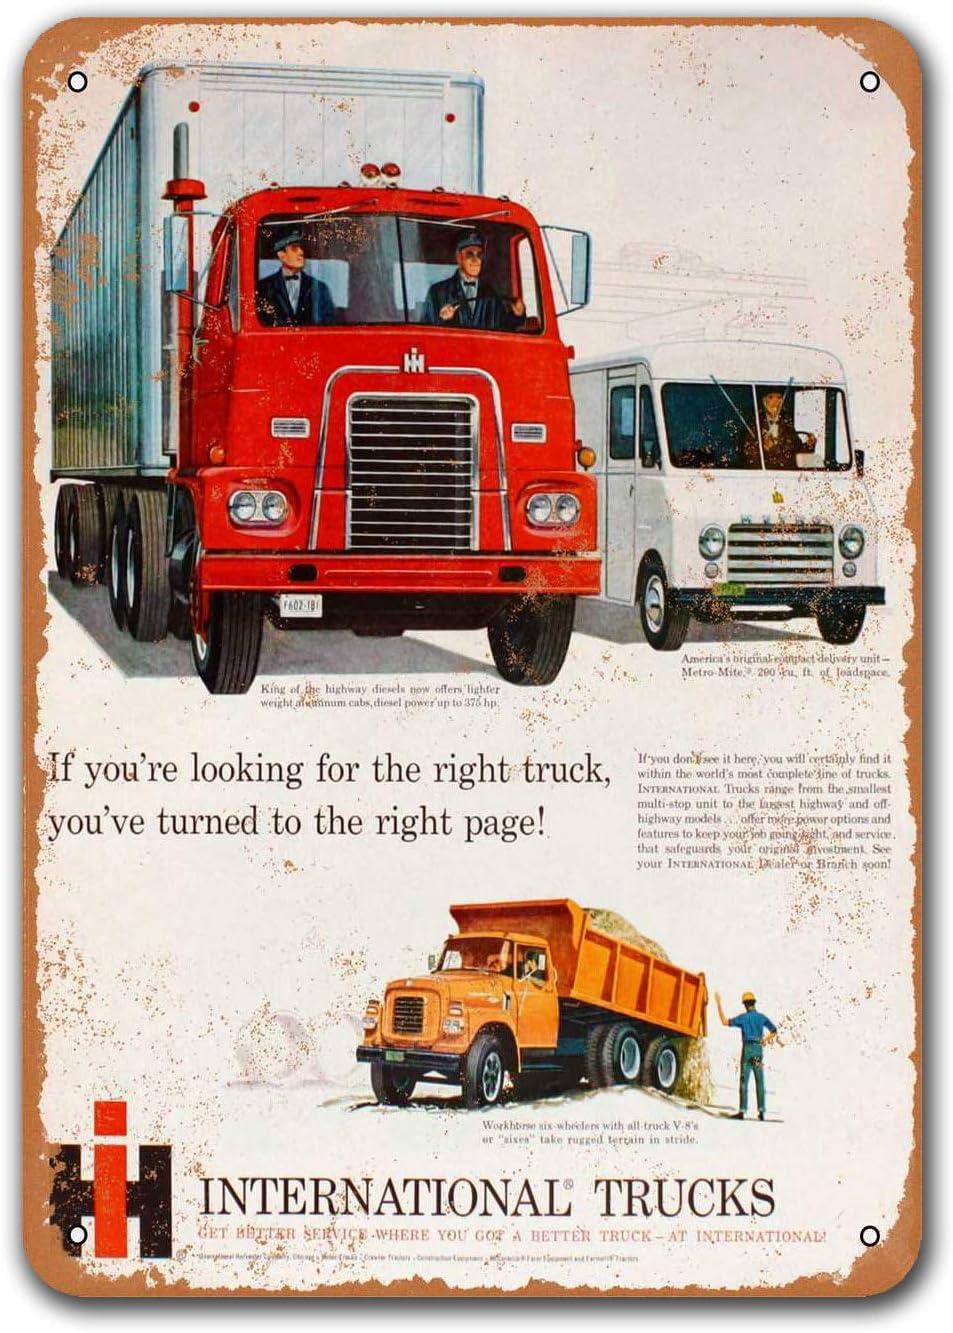 Sisoso 1960 International Trucks Vintage Tin Signs Cars Metal Bar Poster Man Cave Garage Game Room Office Dorm Wall Decor 8x12 inches